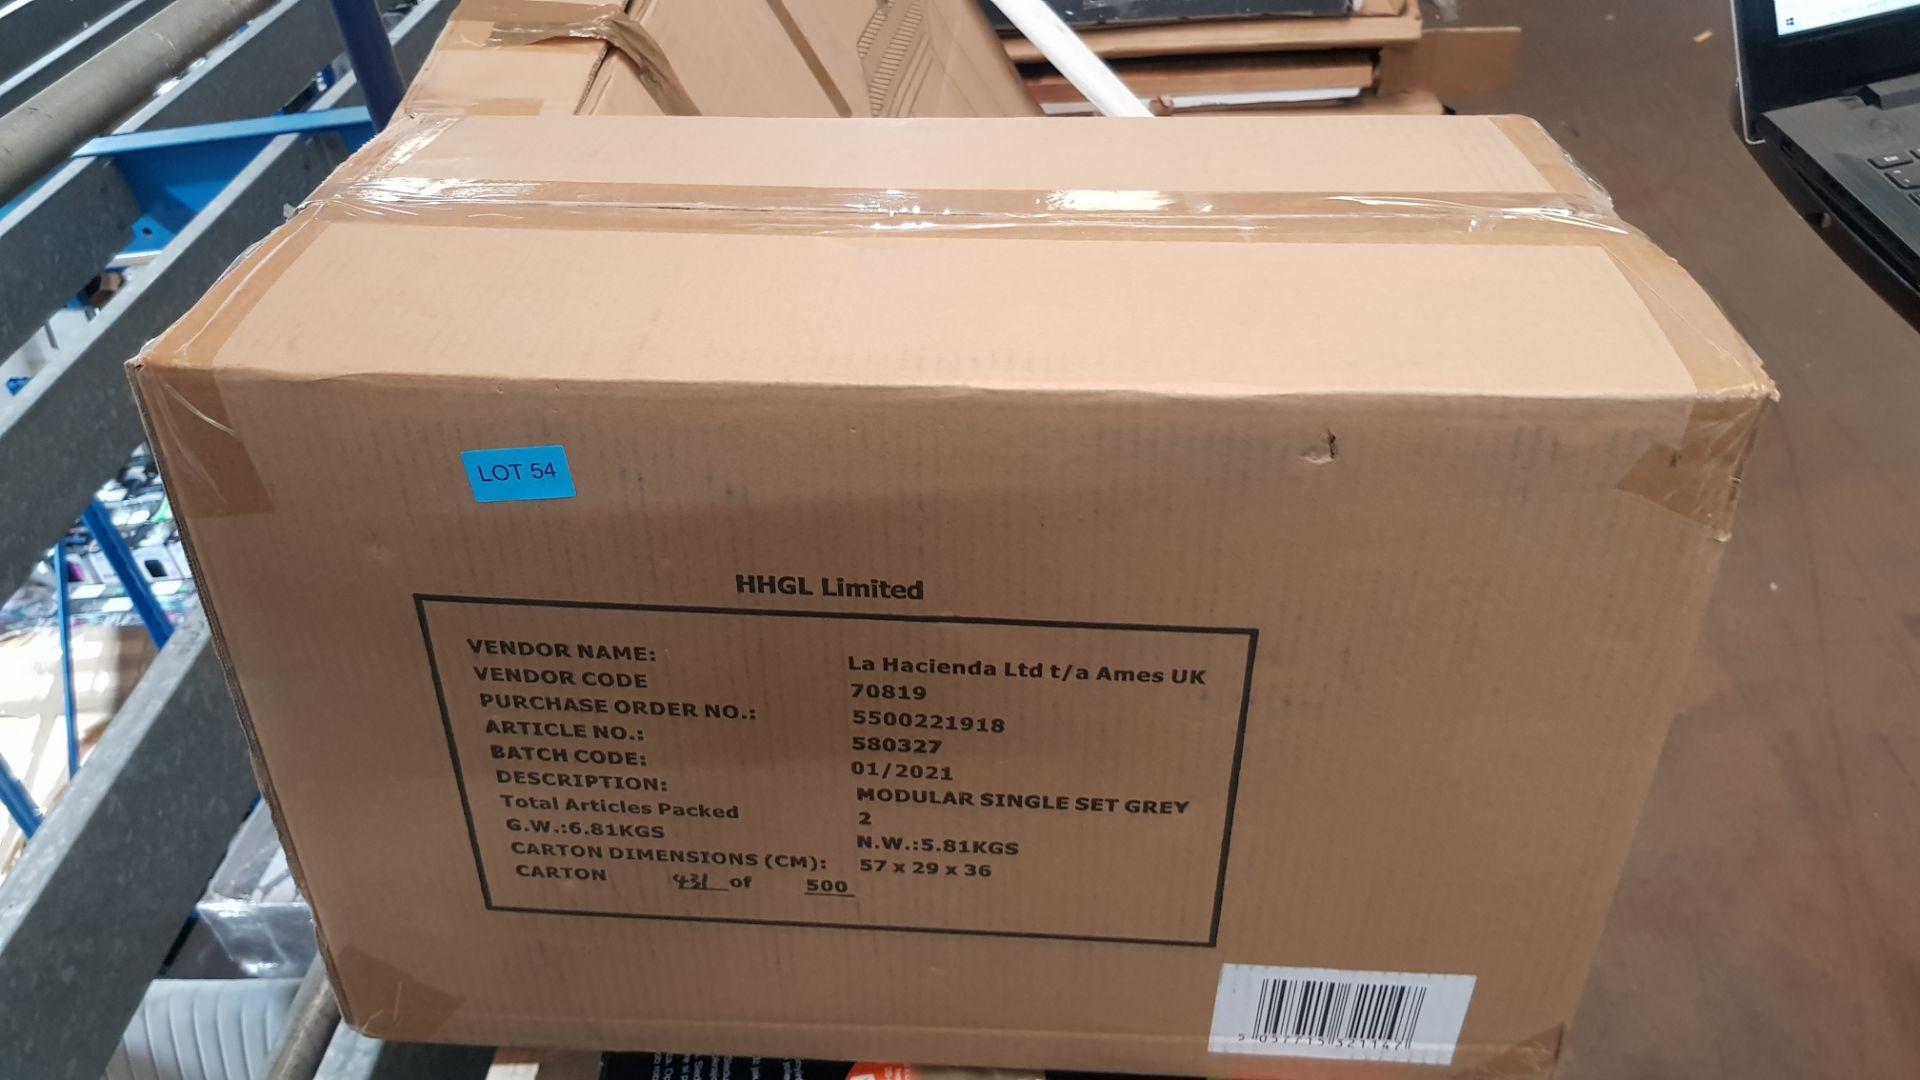 (P6) 2x Botanica Modular Garden Single Set Grey RRP £50 Each. New, Sealed Item. - Image 2 of 2